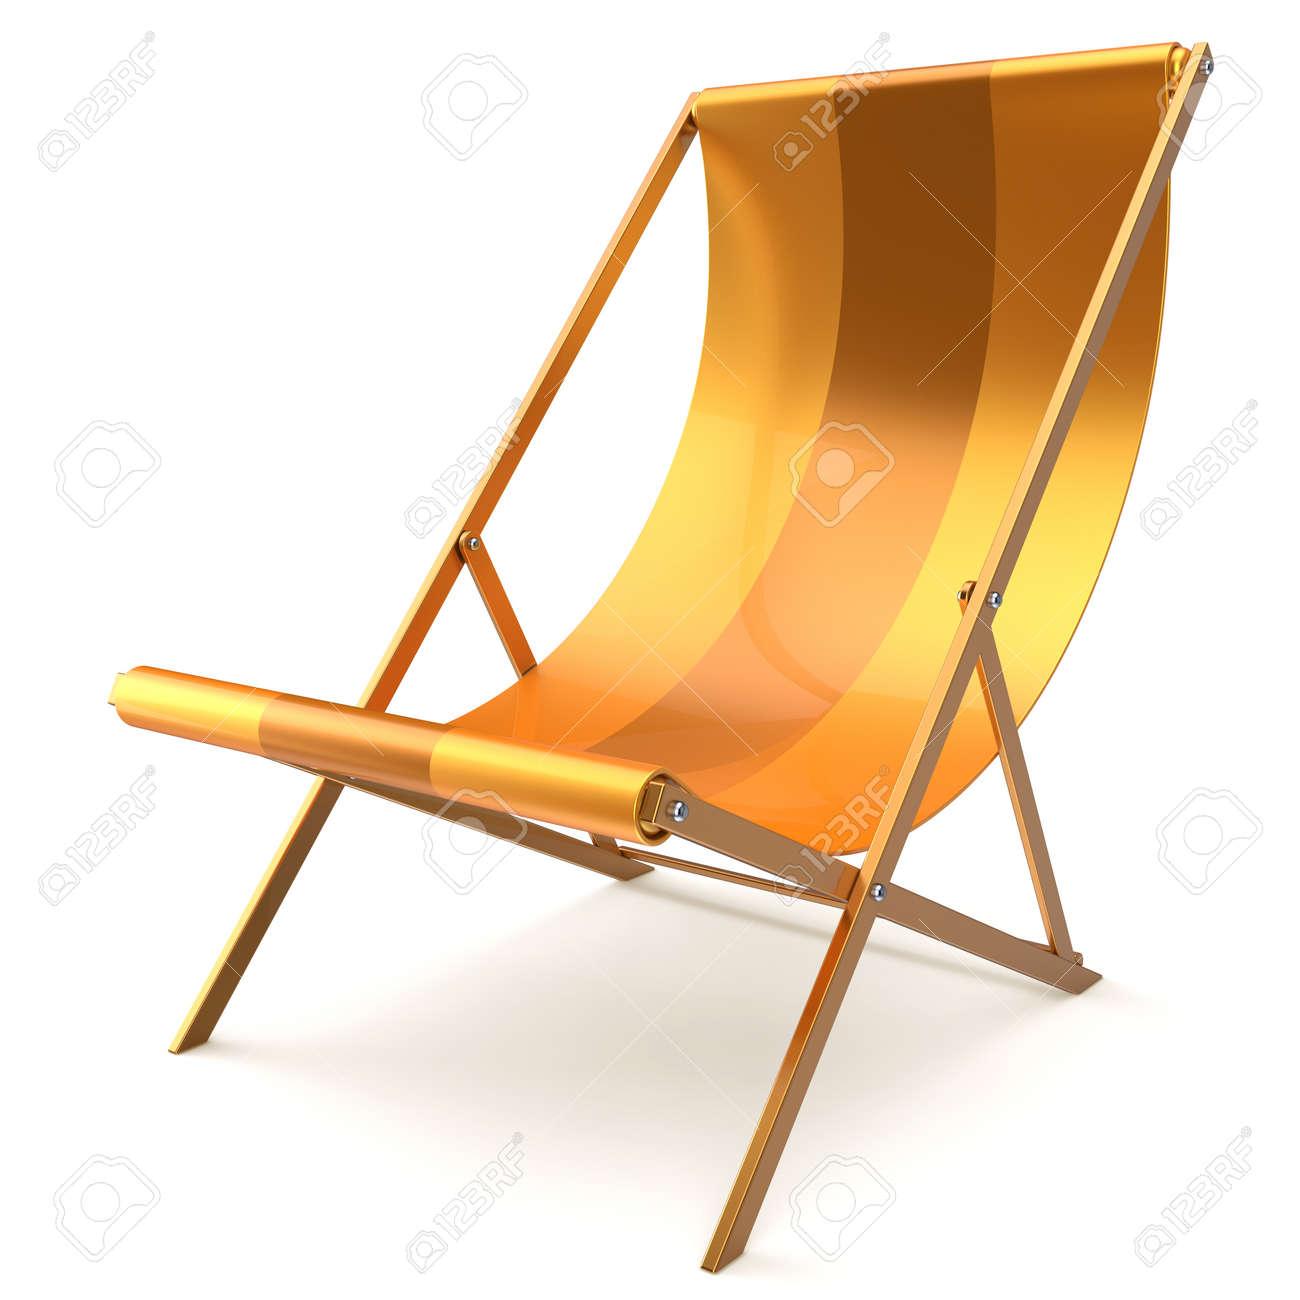 Beach Chair Yellow Chaise Longue Nobody Relaxation Holidays Spa Resort Summer Sun Tropical Sunbathing Travel Leisure